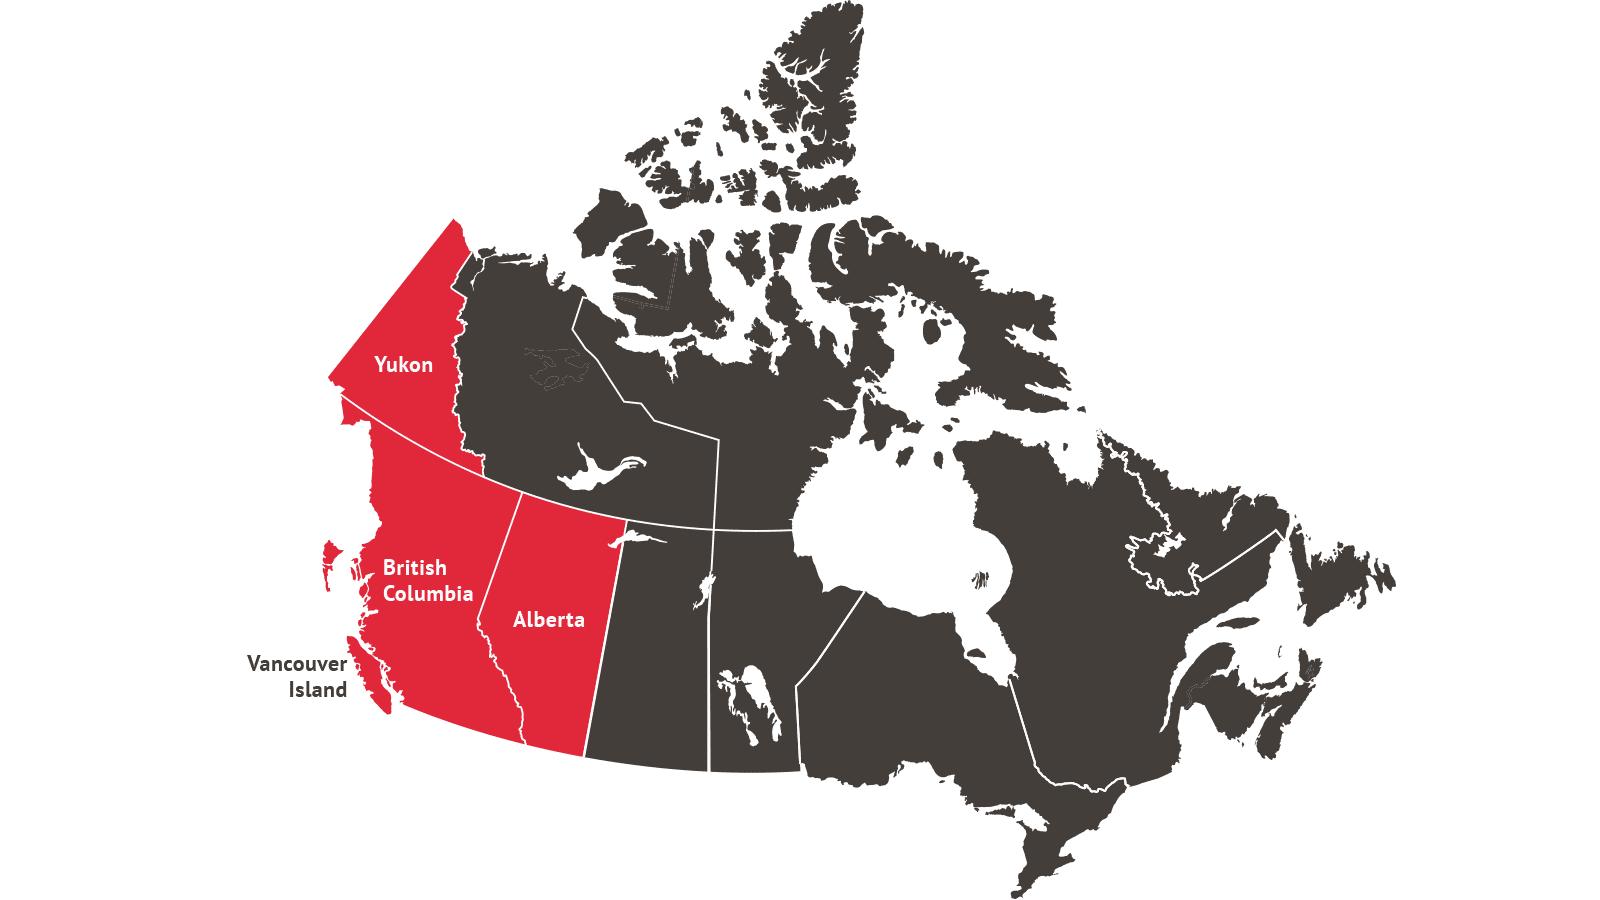 Regions in Western Canada where TerraCana operates